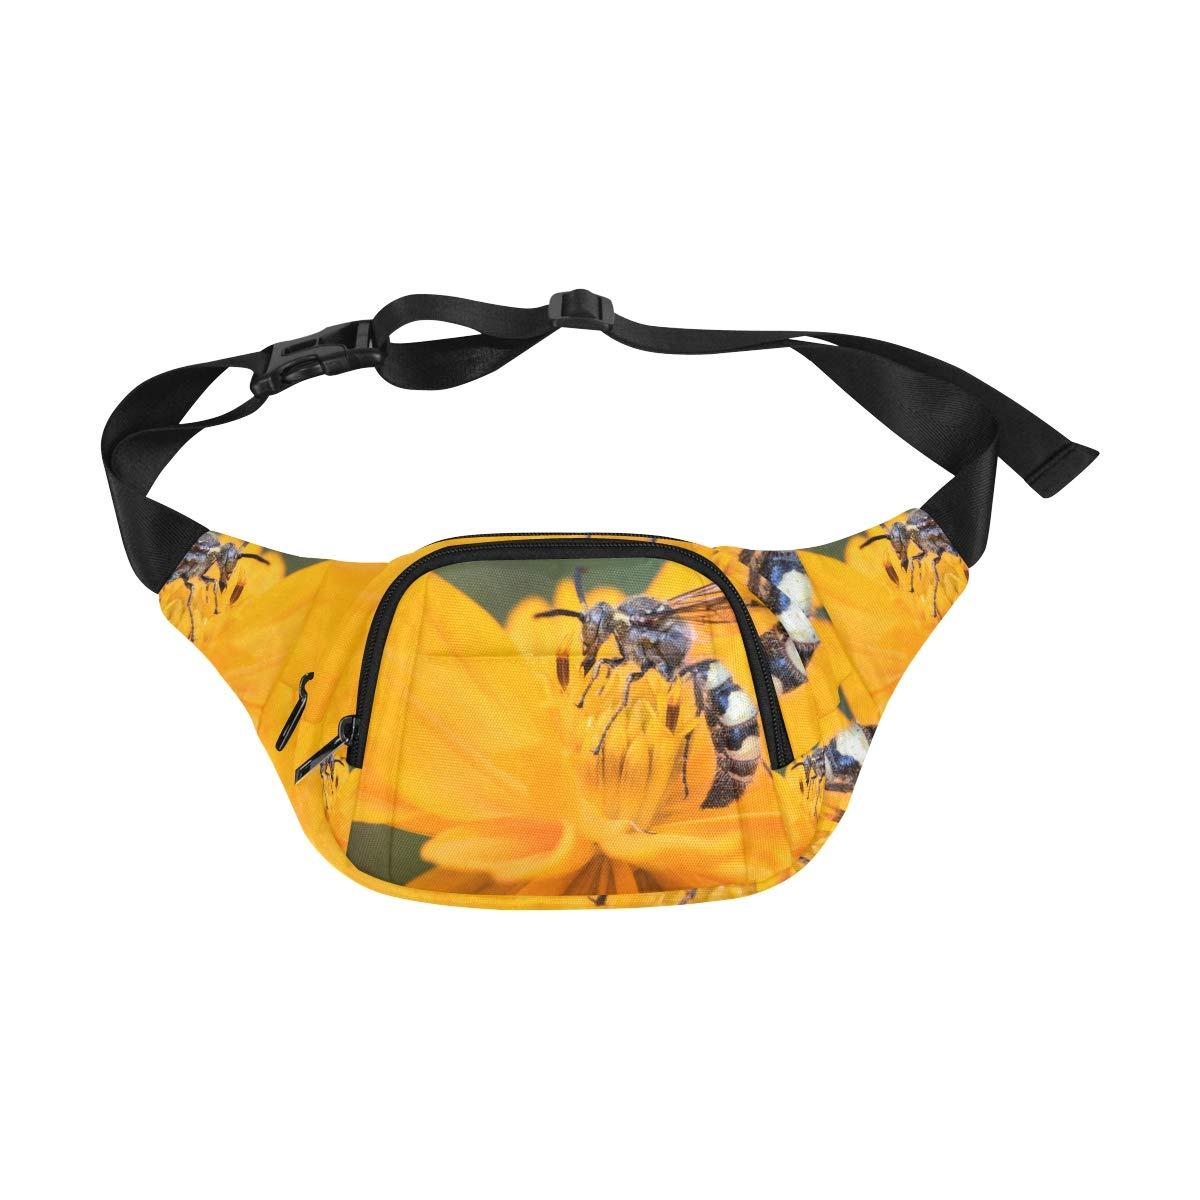 A European Wasp Pattern Fenny Packs Waist Bags Adjustable Belt Waterproof Nylon Travel Running Sport Vacation Party For Men Women Boys Girls Kids